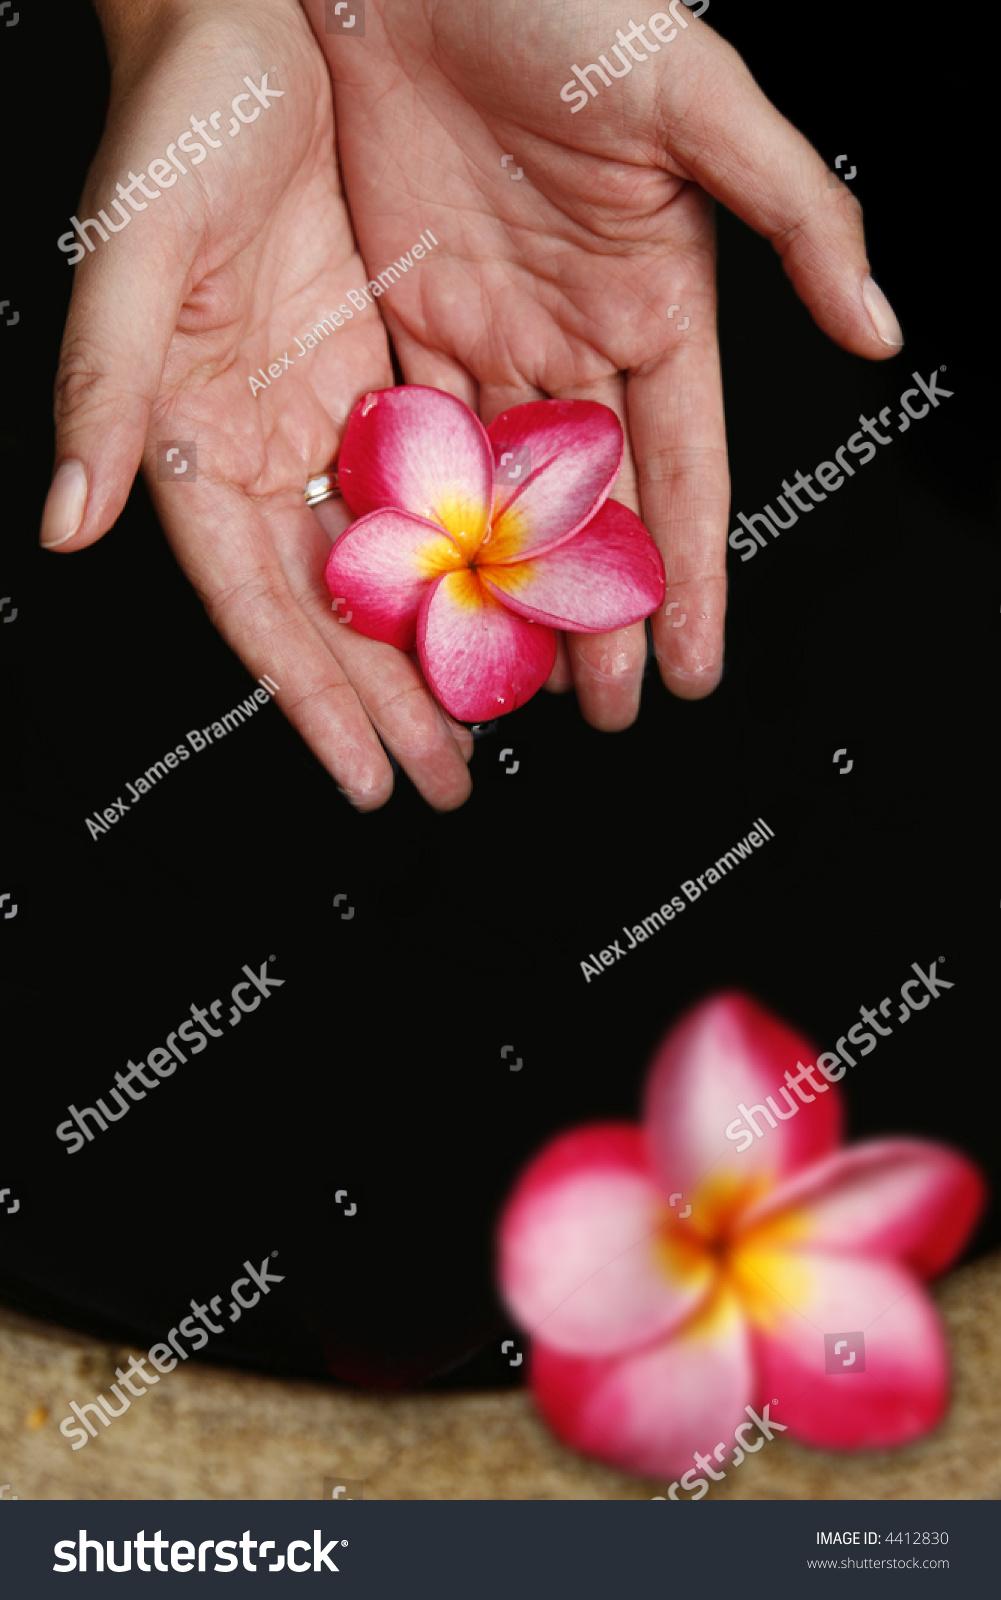 pink magnolia flower deep - photo #12